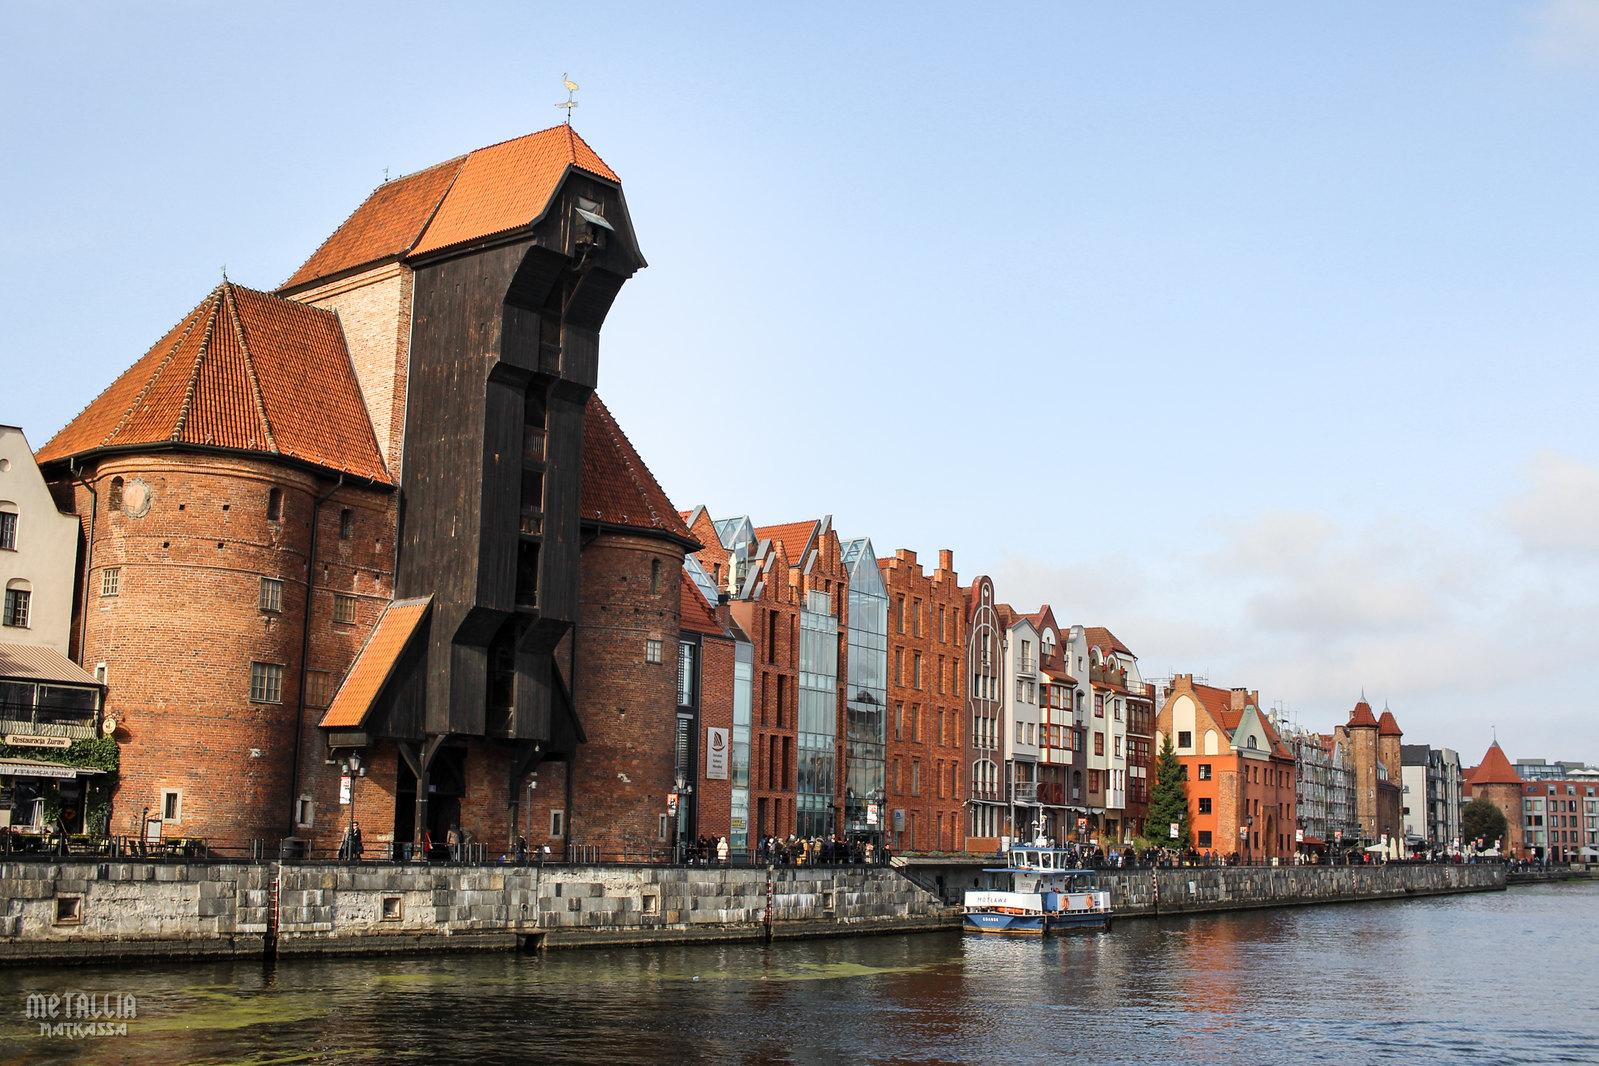 gdansk, gdanskin vanha kaupunki, gdansk old town, gdansk stare miasto, the crane